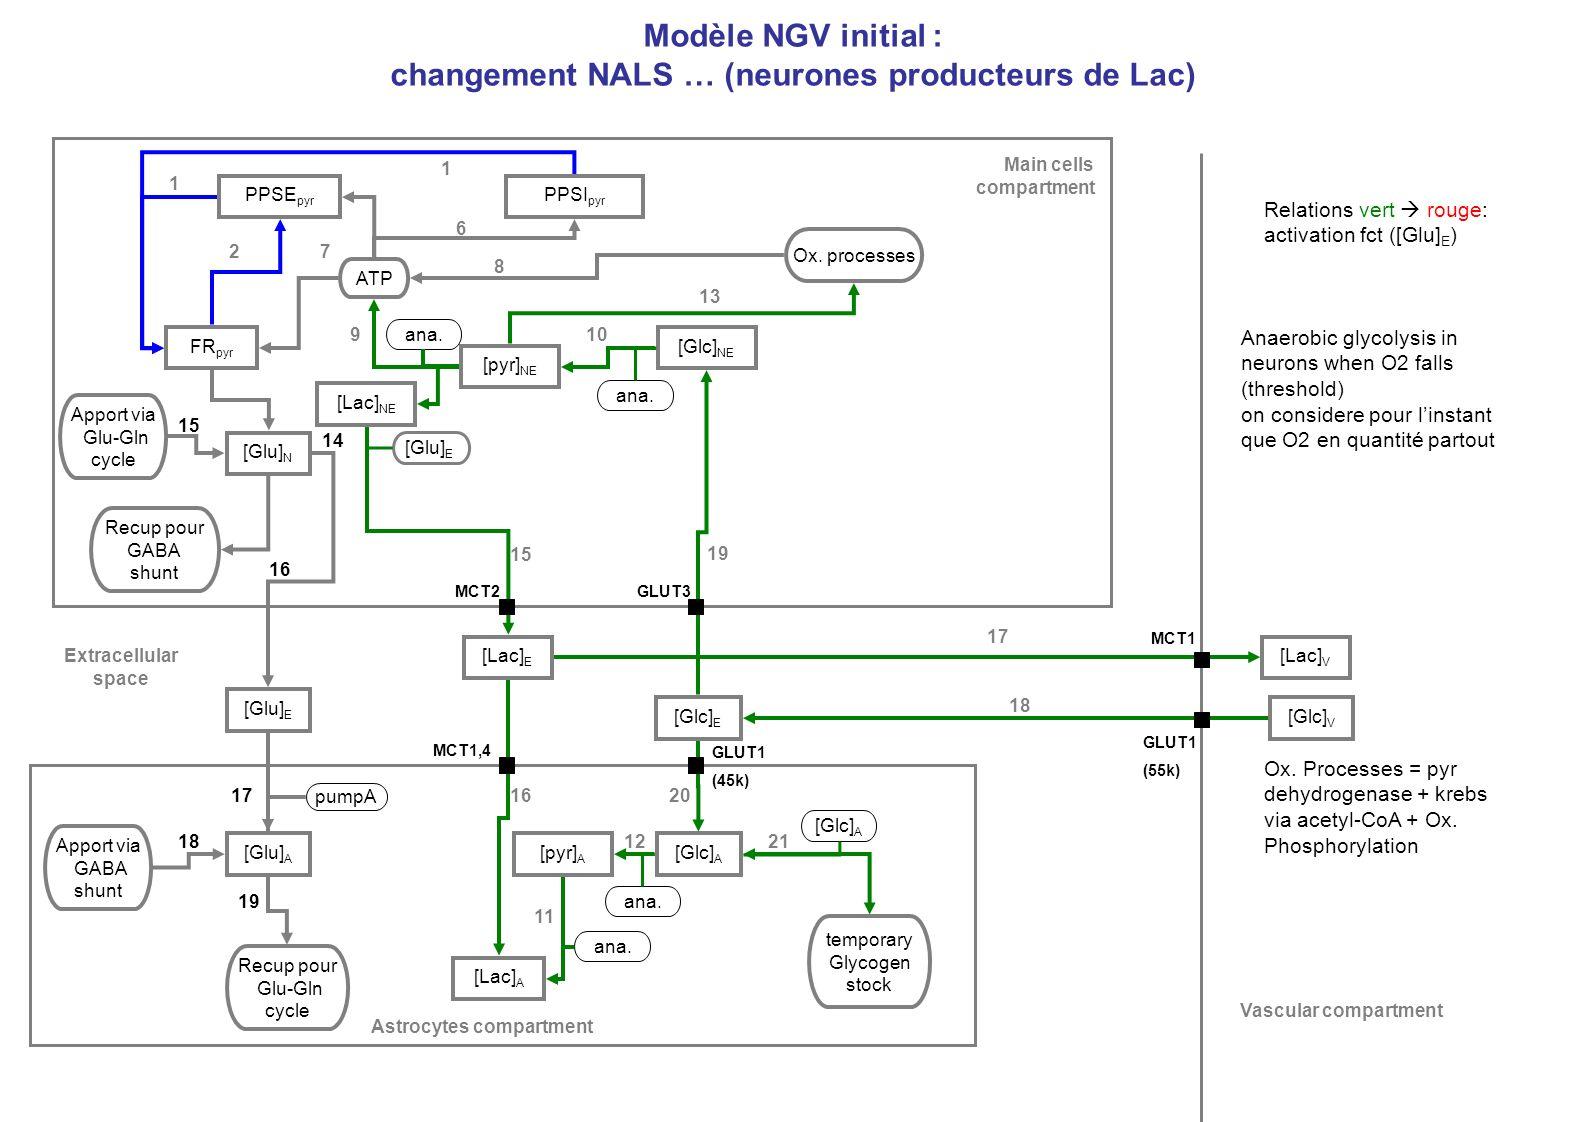 Extracellular space Main cells compartment Astrocytes compartment Vascular compartment Modèle NGV initial : changement NALS … (neurones producteurs de